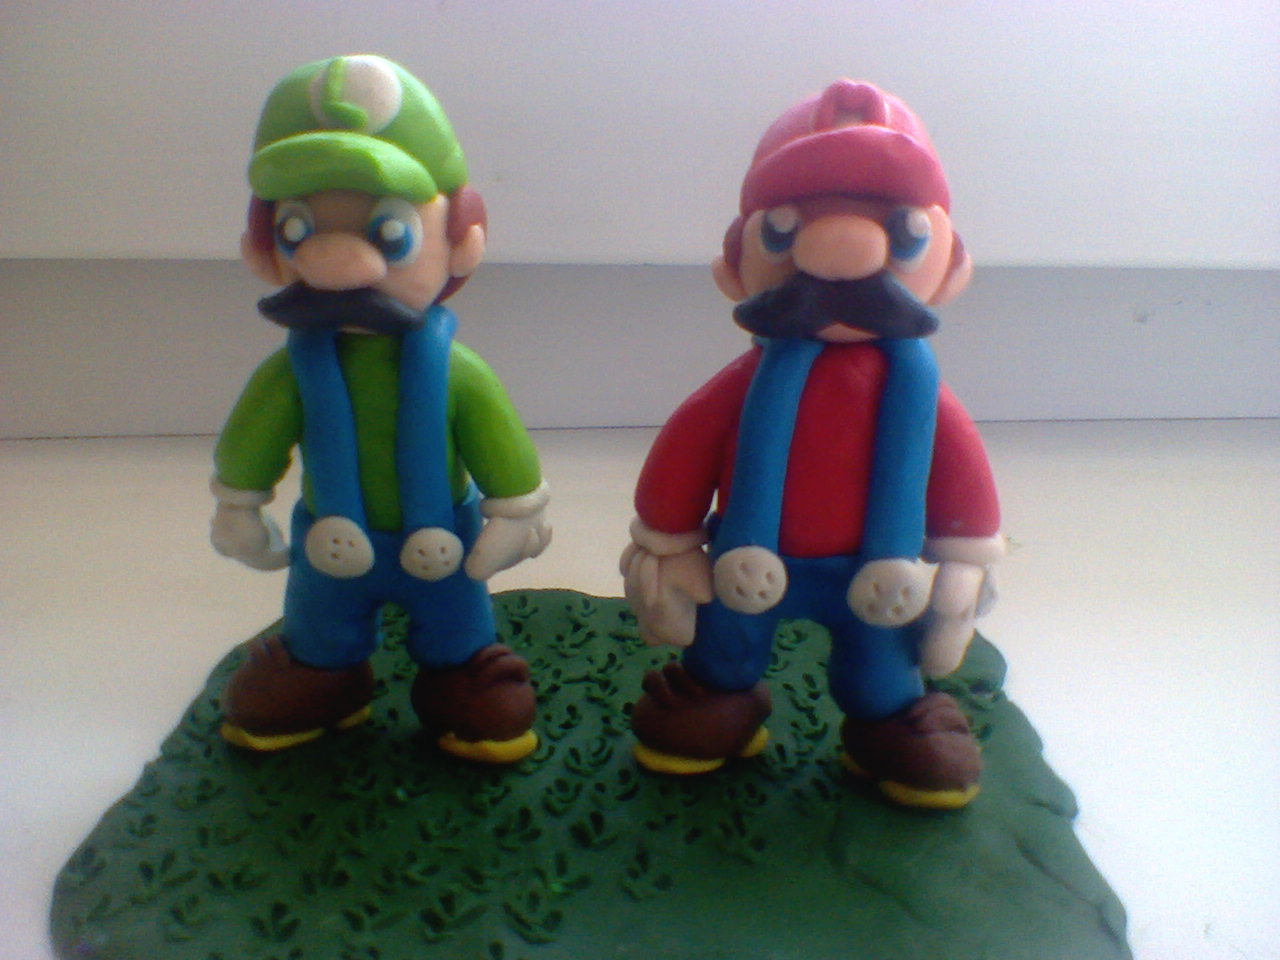 Mario & Luigi in grass